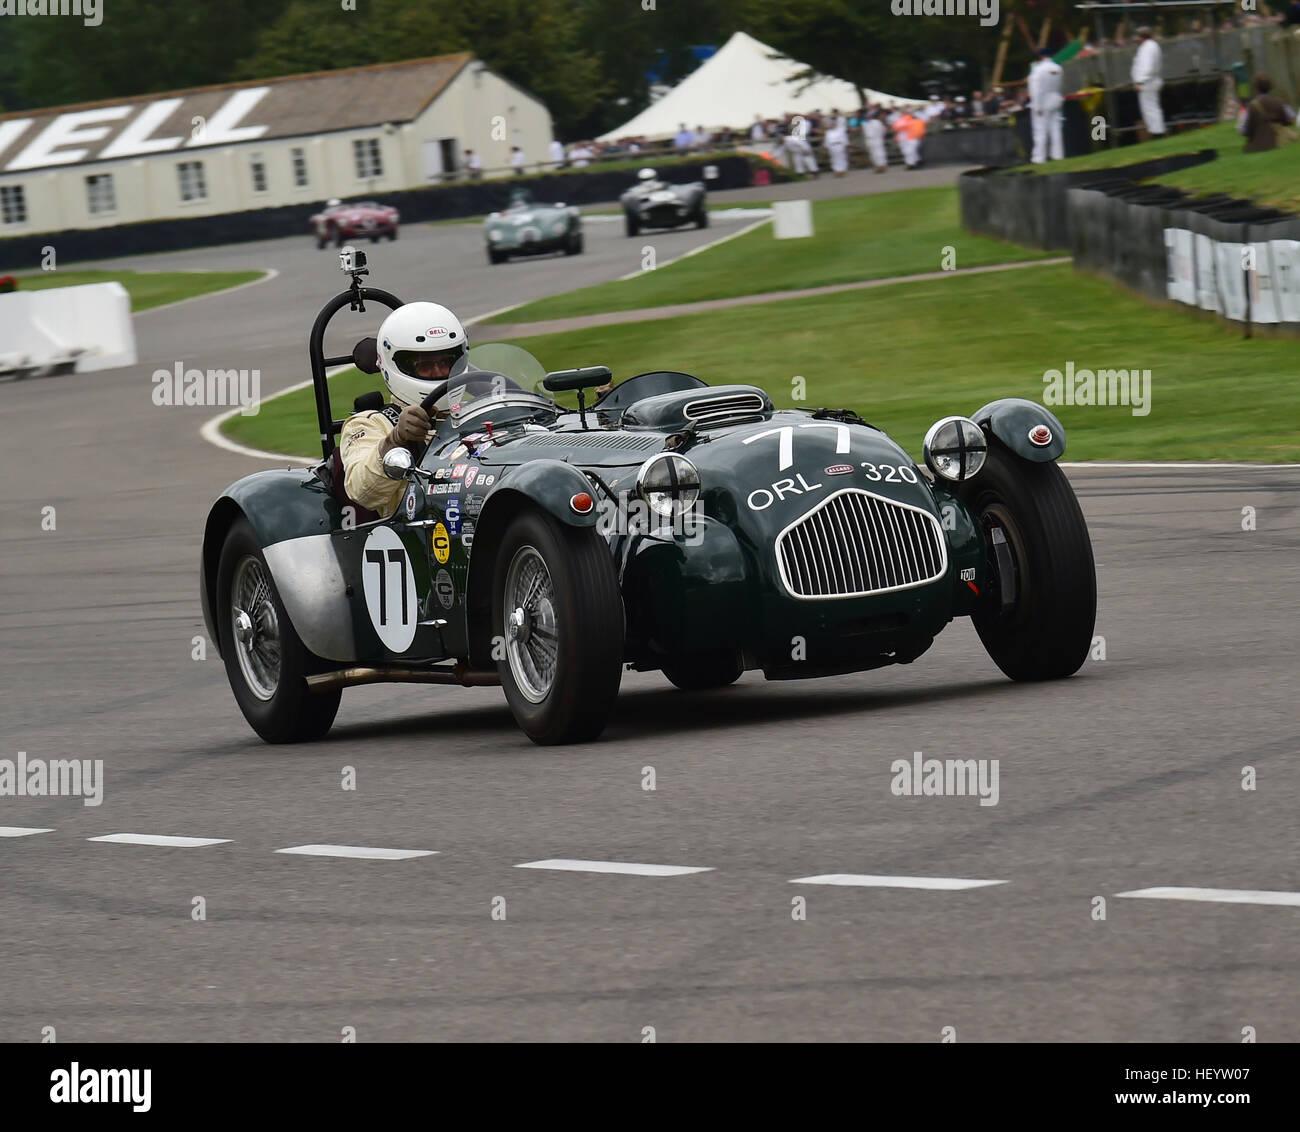 Massimo Bettati, Allard J2X, Freddie März Memorial Trophy, Sports Racing Cars, Goodwood Revival 2016, 2016, Stockbild